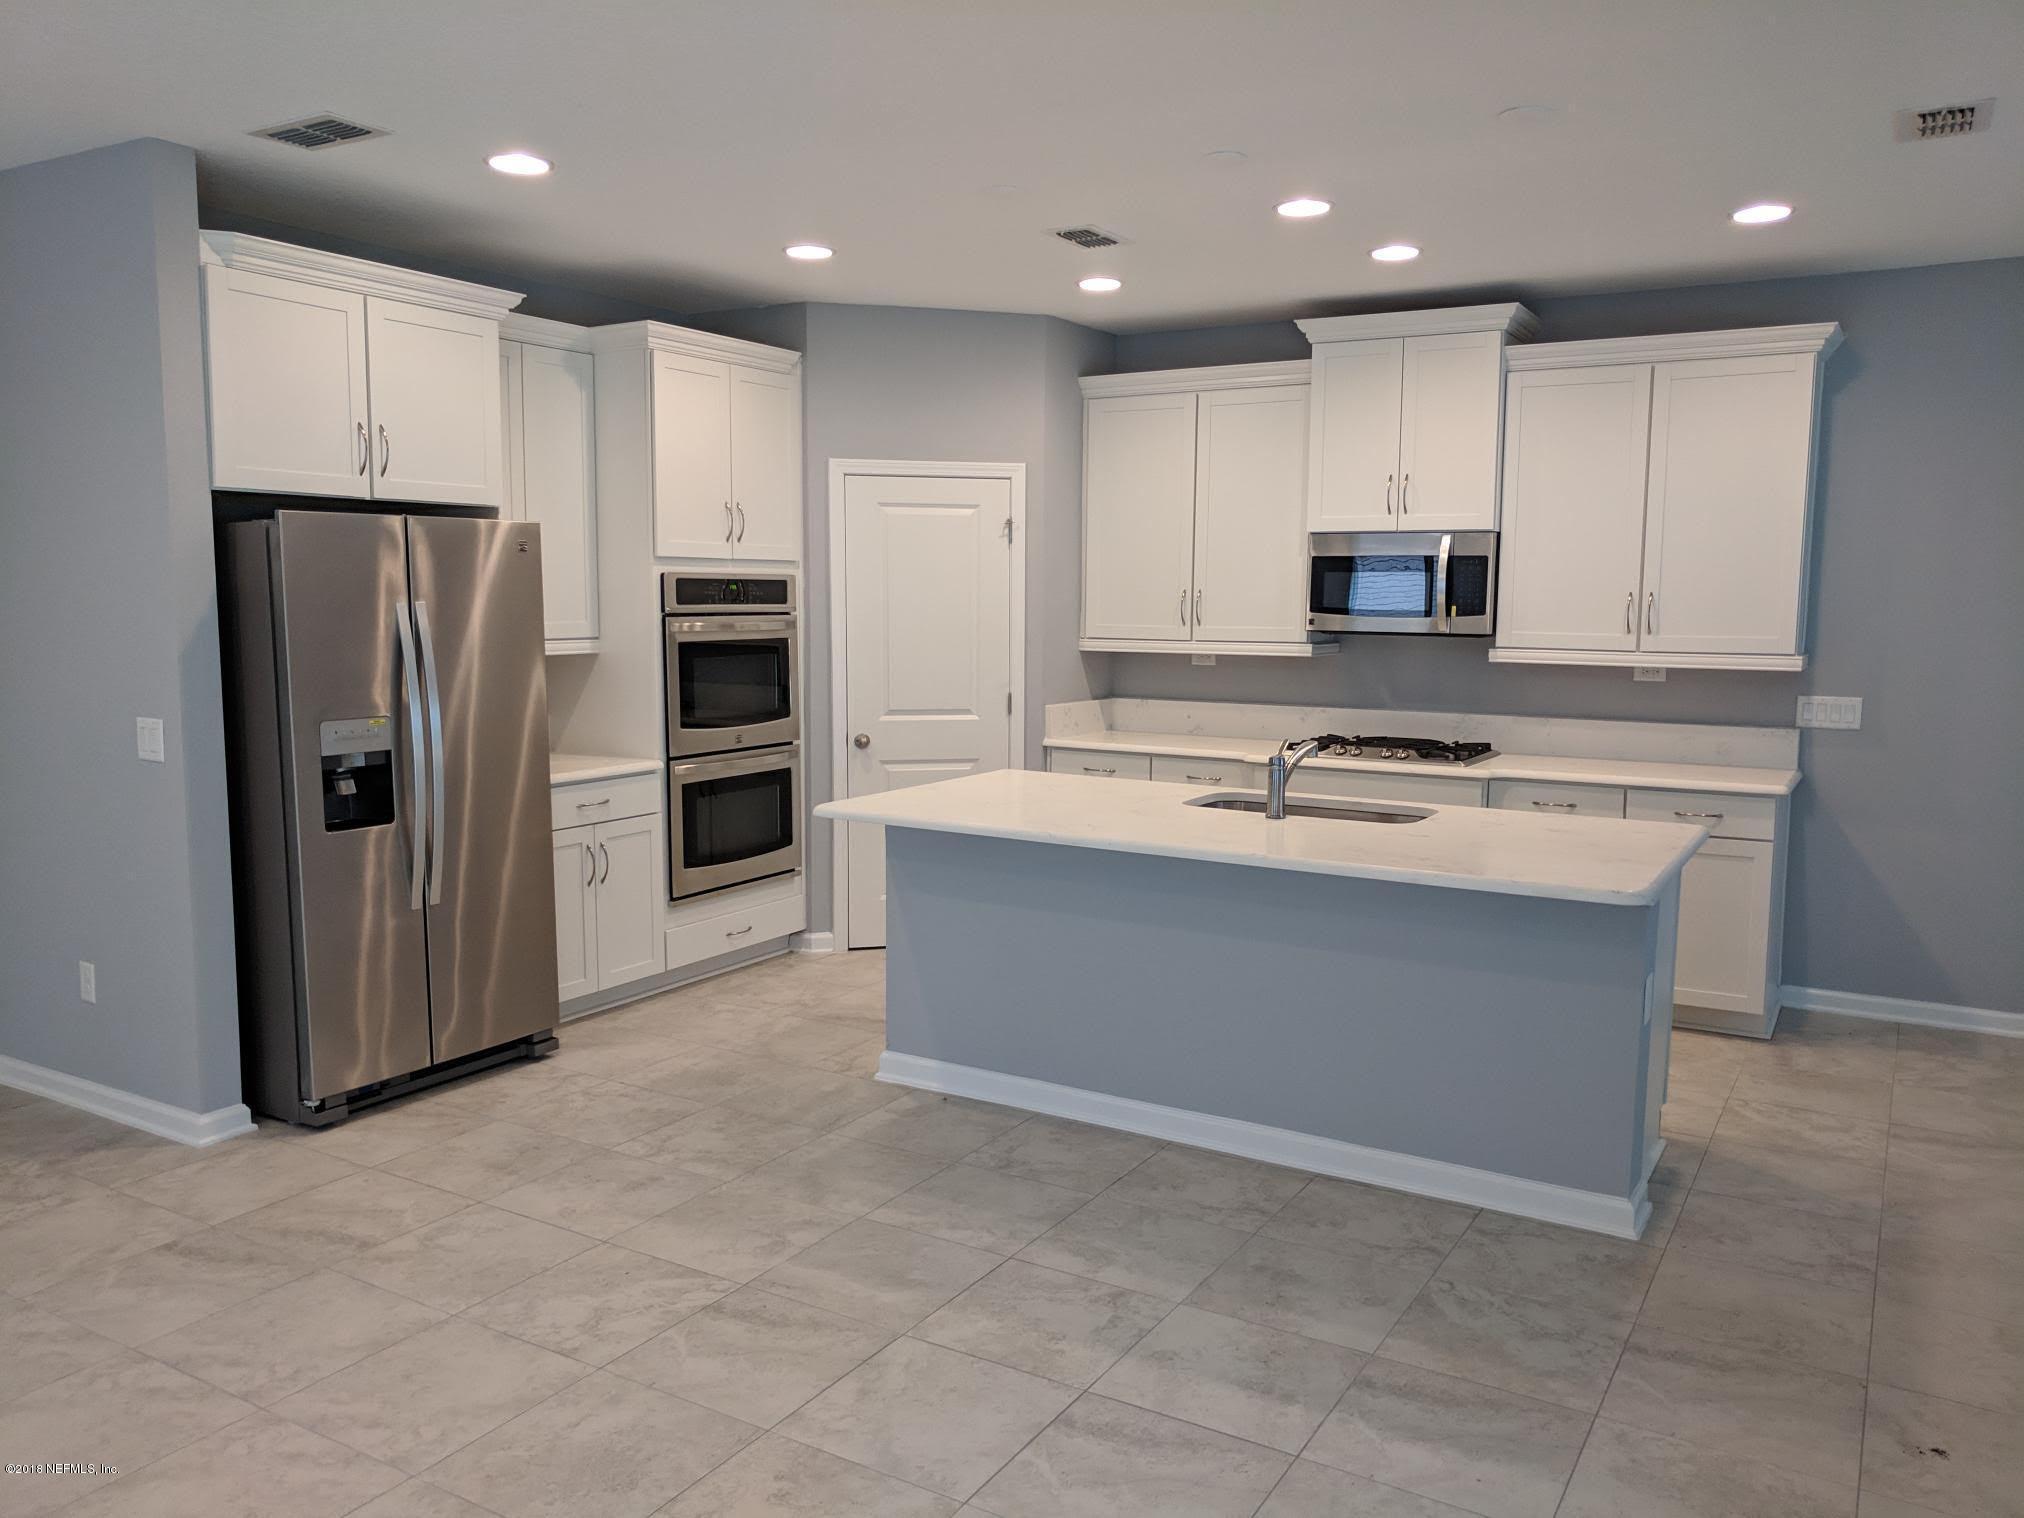 110 COTTAGE LINK WALK, ST AUGUSTINE, FLORIDA 32092, 4 Bedrooms Bedrooms, ,3 BathroomsBathrooms,Residential - single family,For sale,COTTAGE LINK WALK,916240